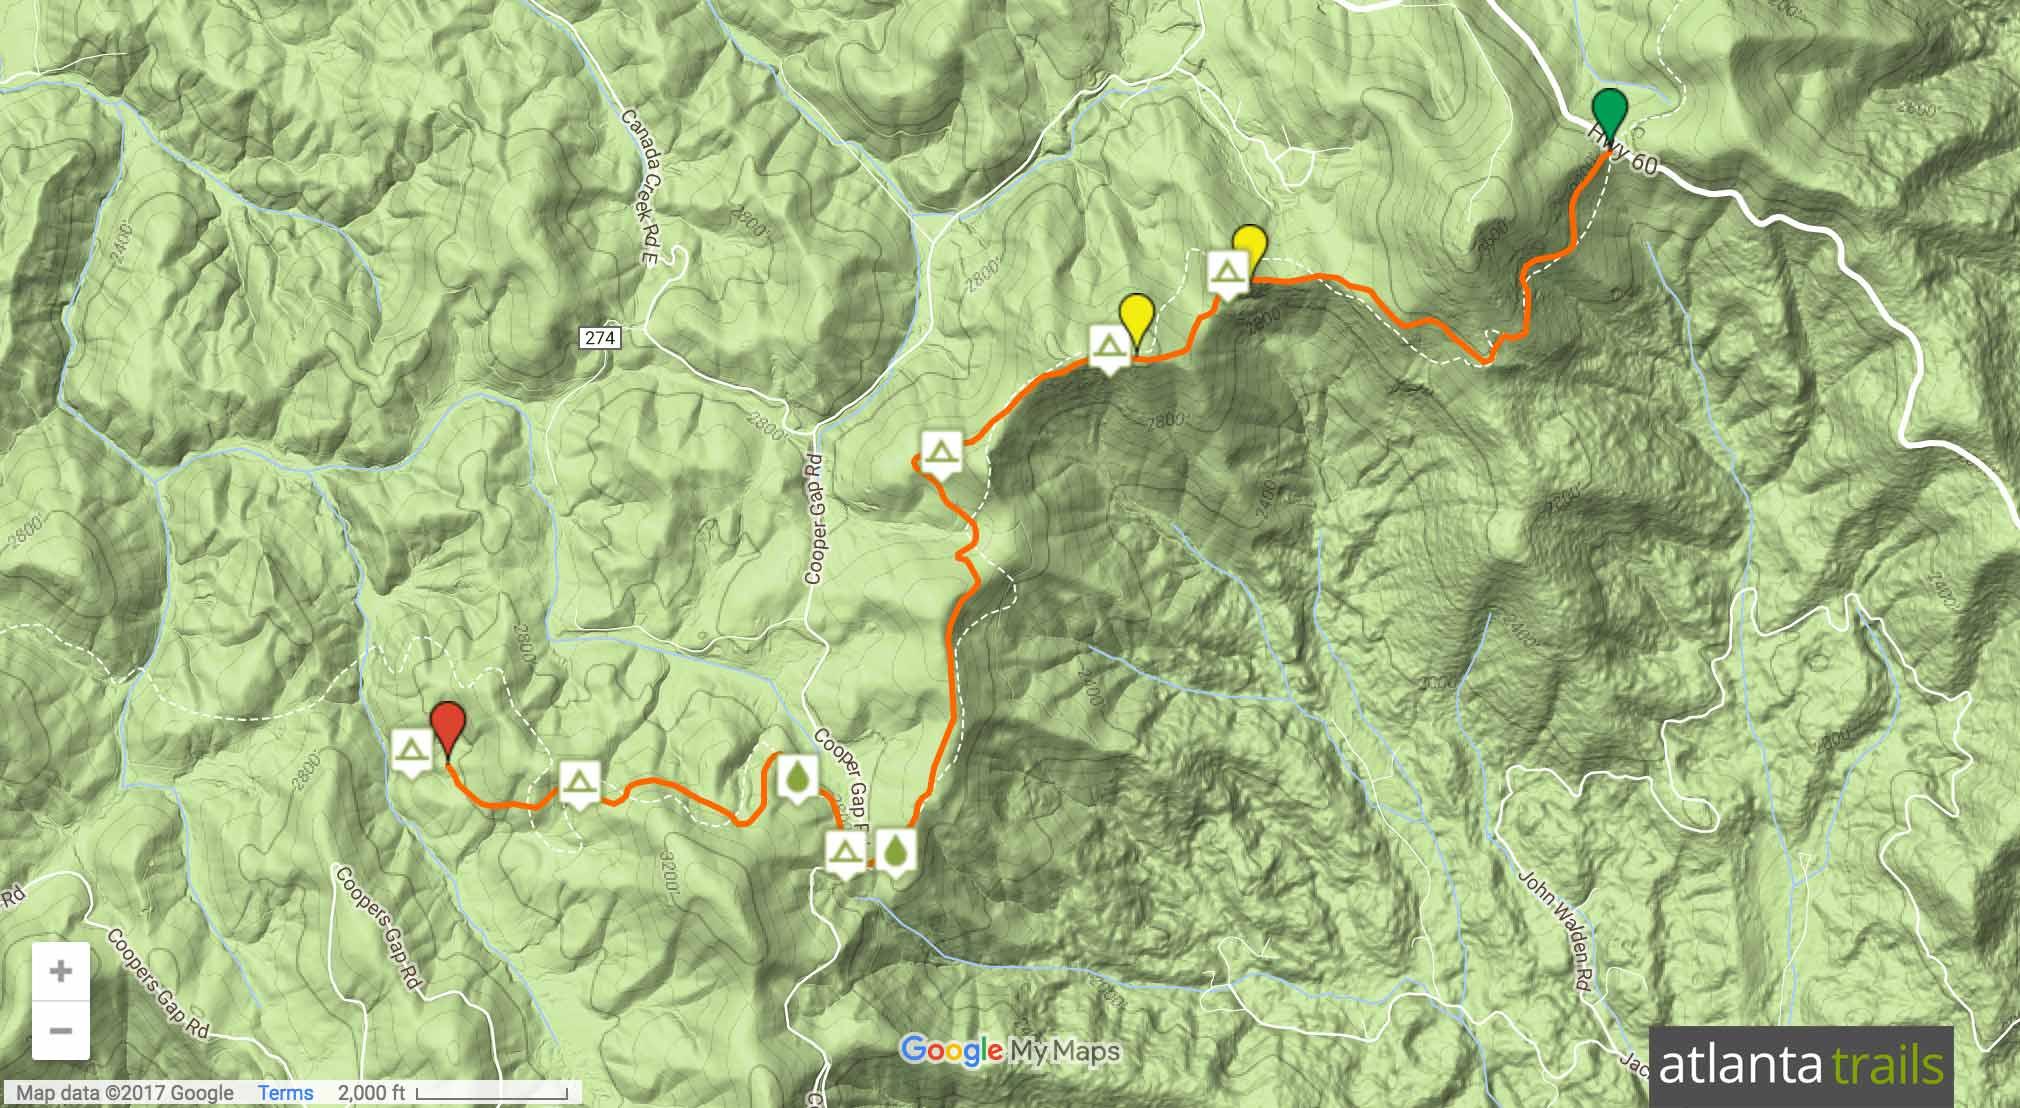 Appalachian Trail: Woody Gap to Ramrock Mountain Map